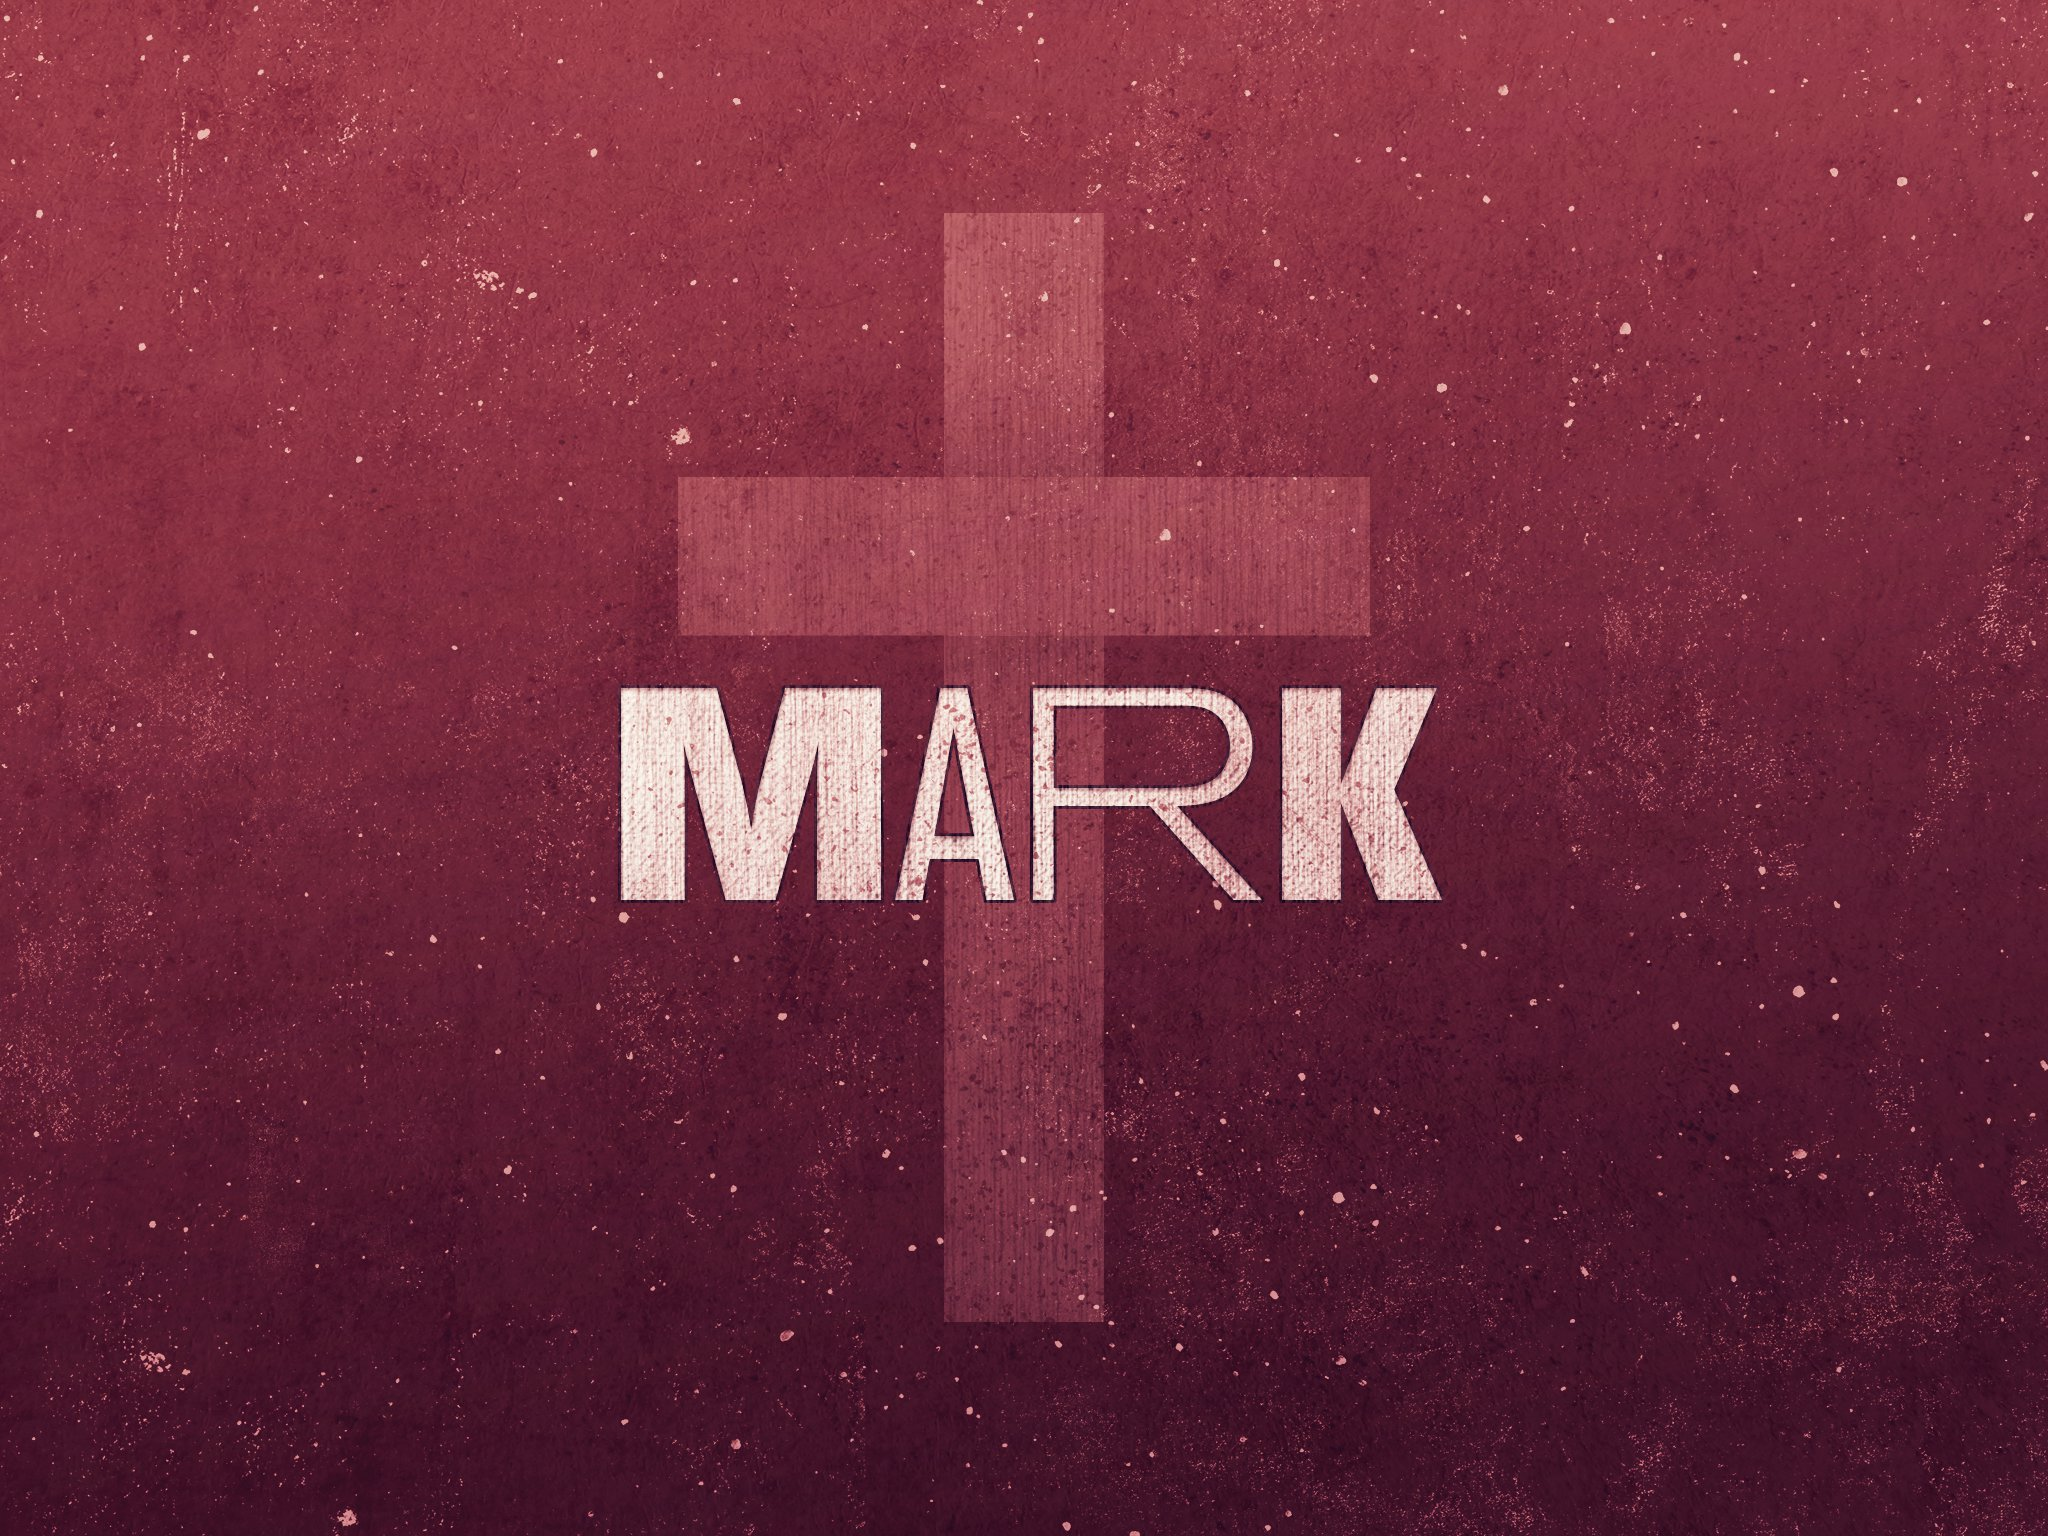 41-Mark_Title_4x3-fullscreen.jpg